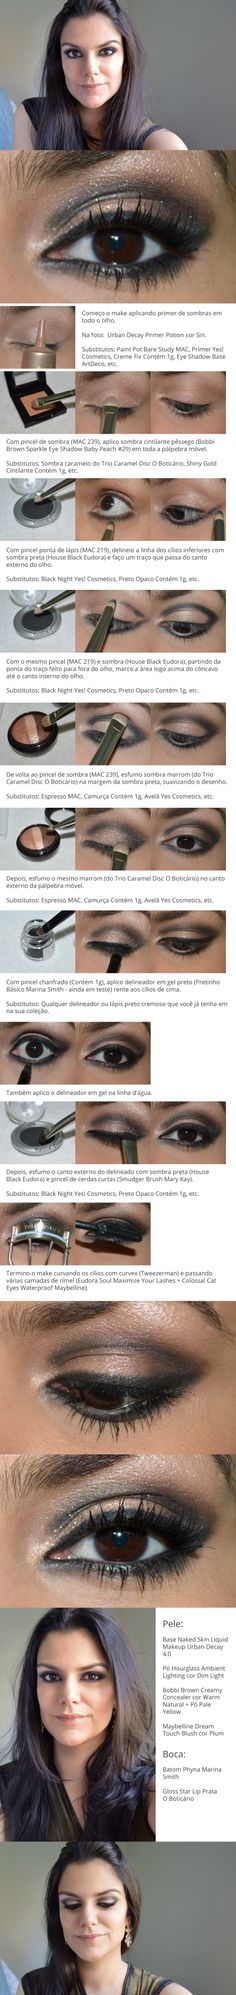 Tutorial: Noturno http://www.2beauty.com.br/blog/2014/01/31/tutorial-noturno/ #maquiagem #makeup